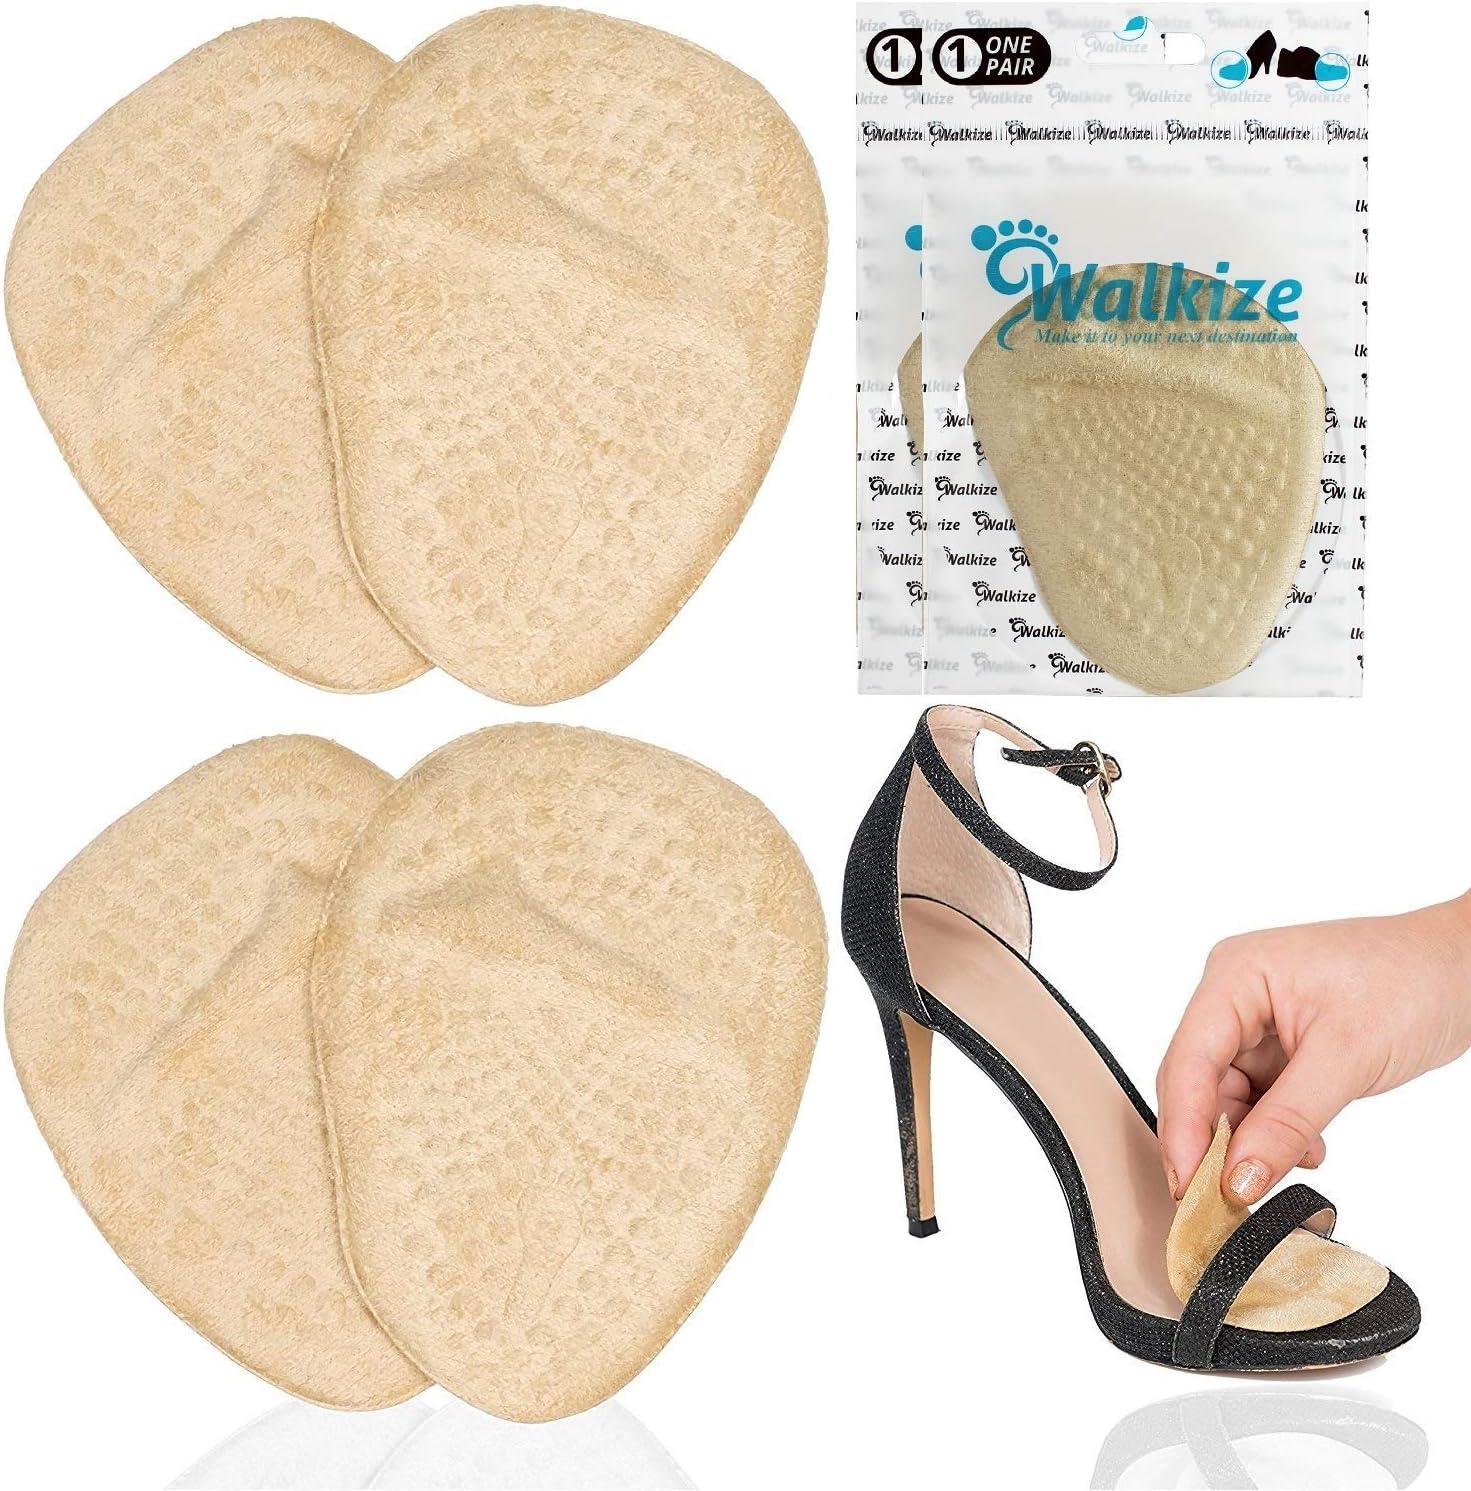 Metatarsal pads by Walkize